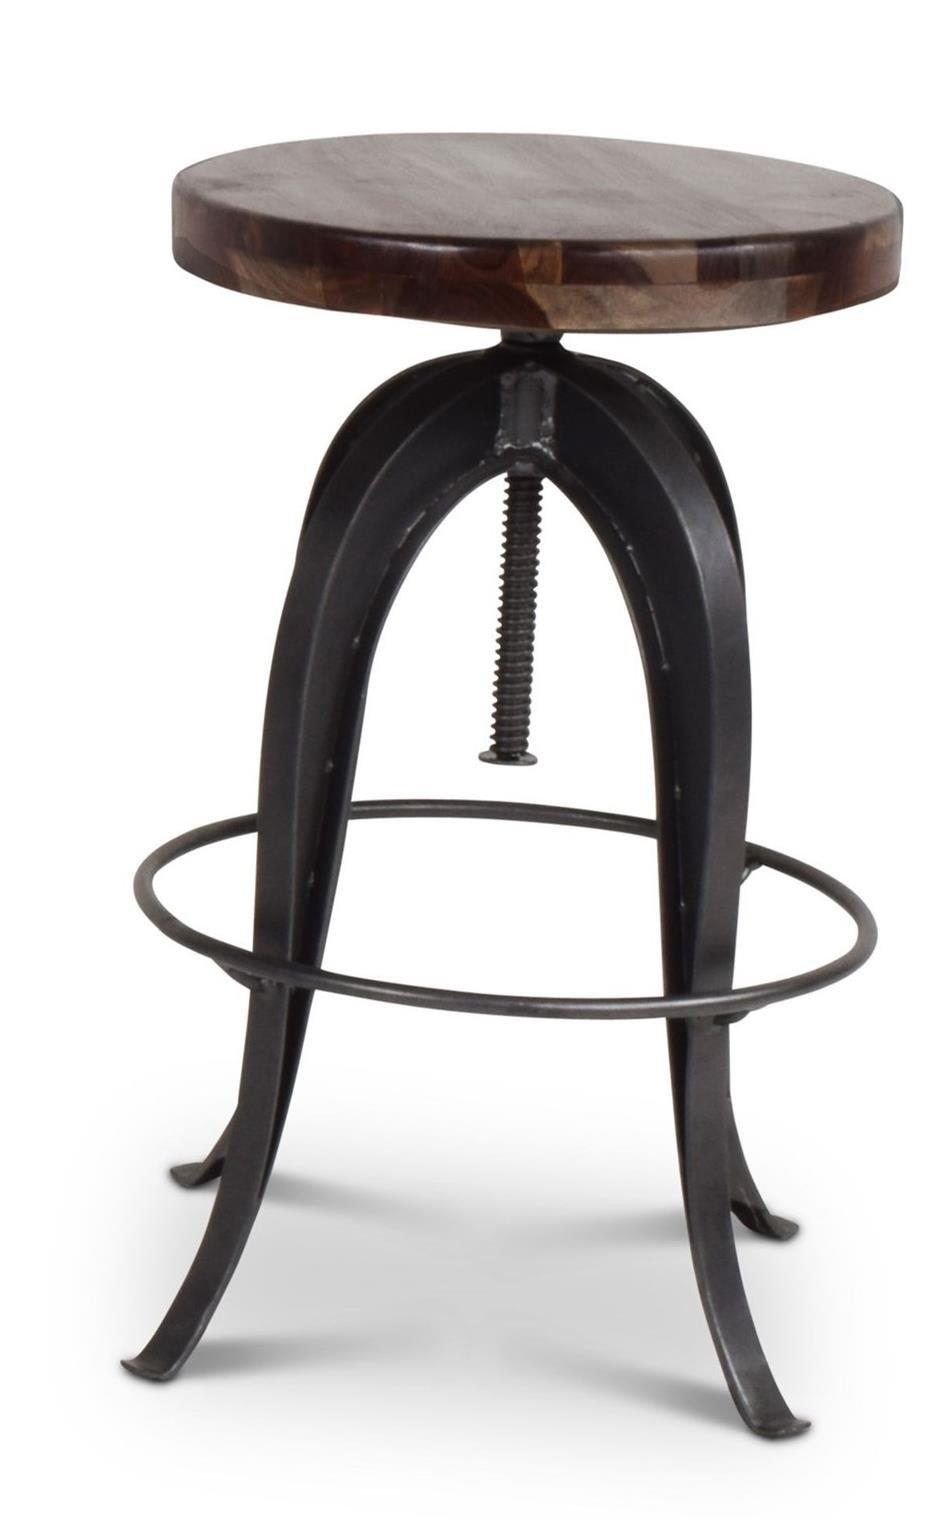 Adjustable Round Stool